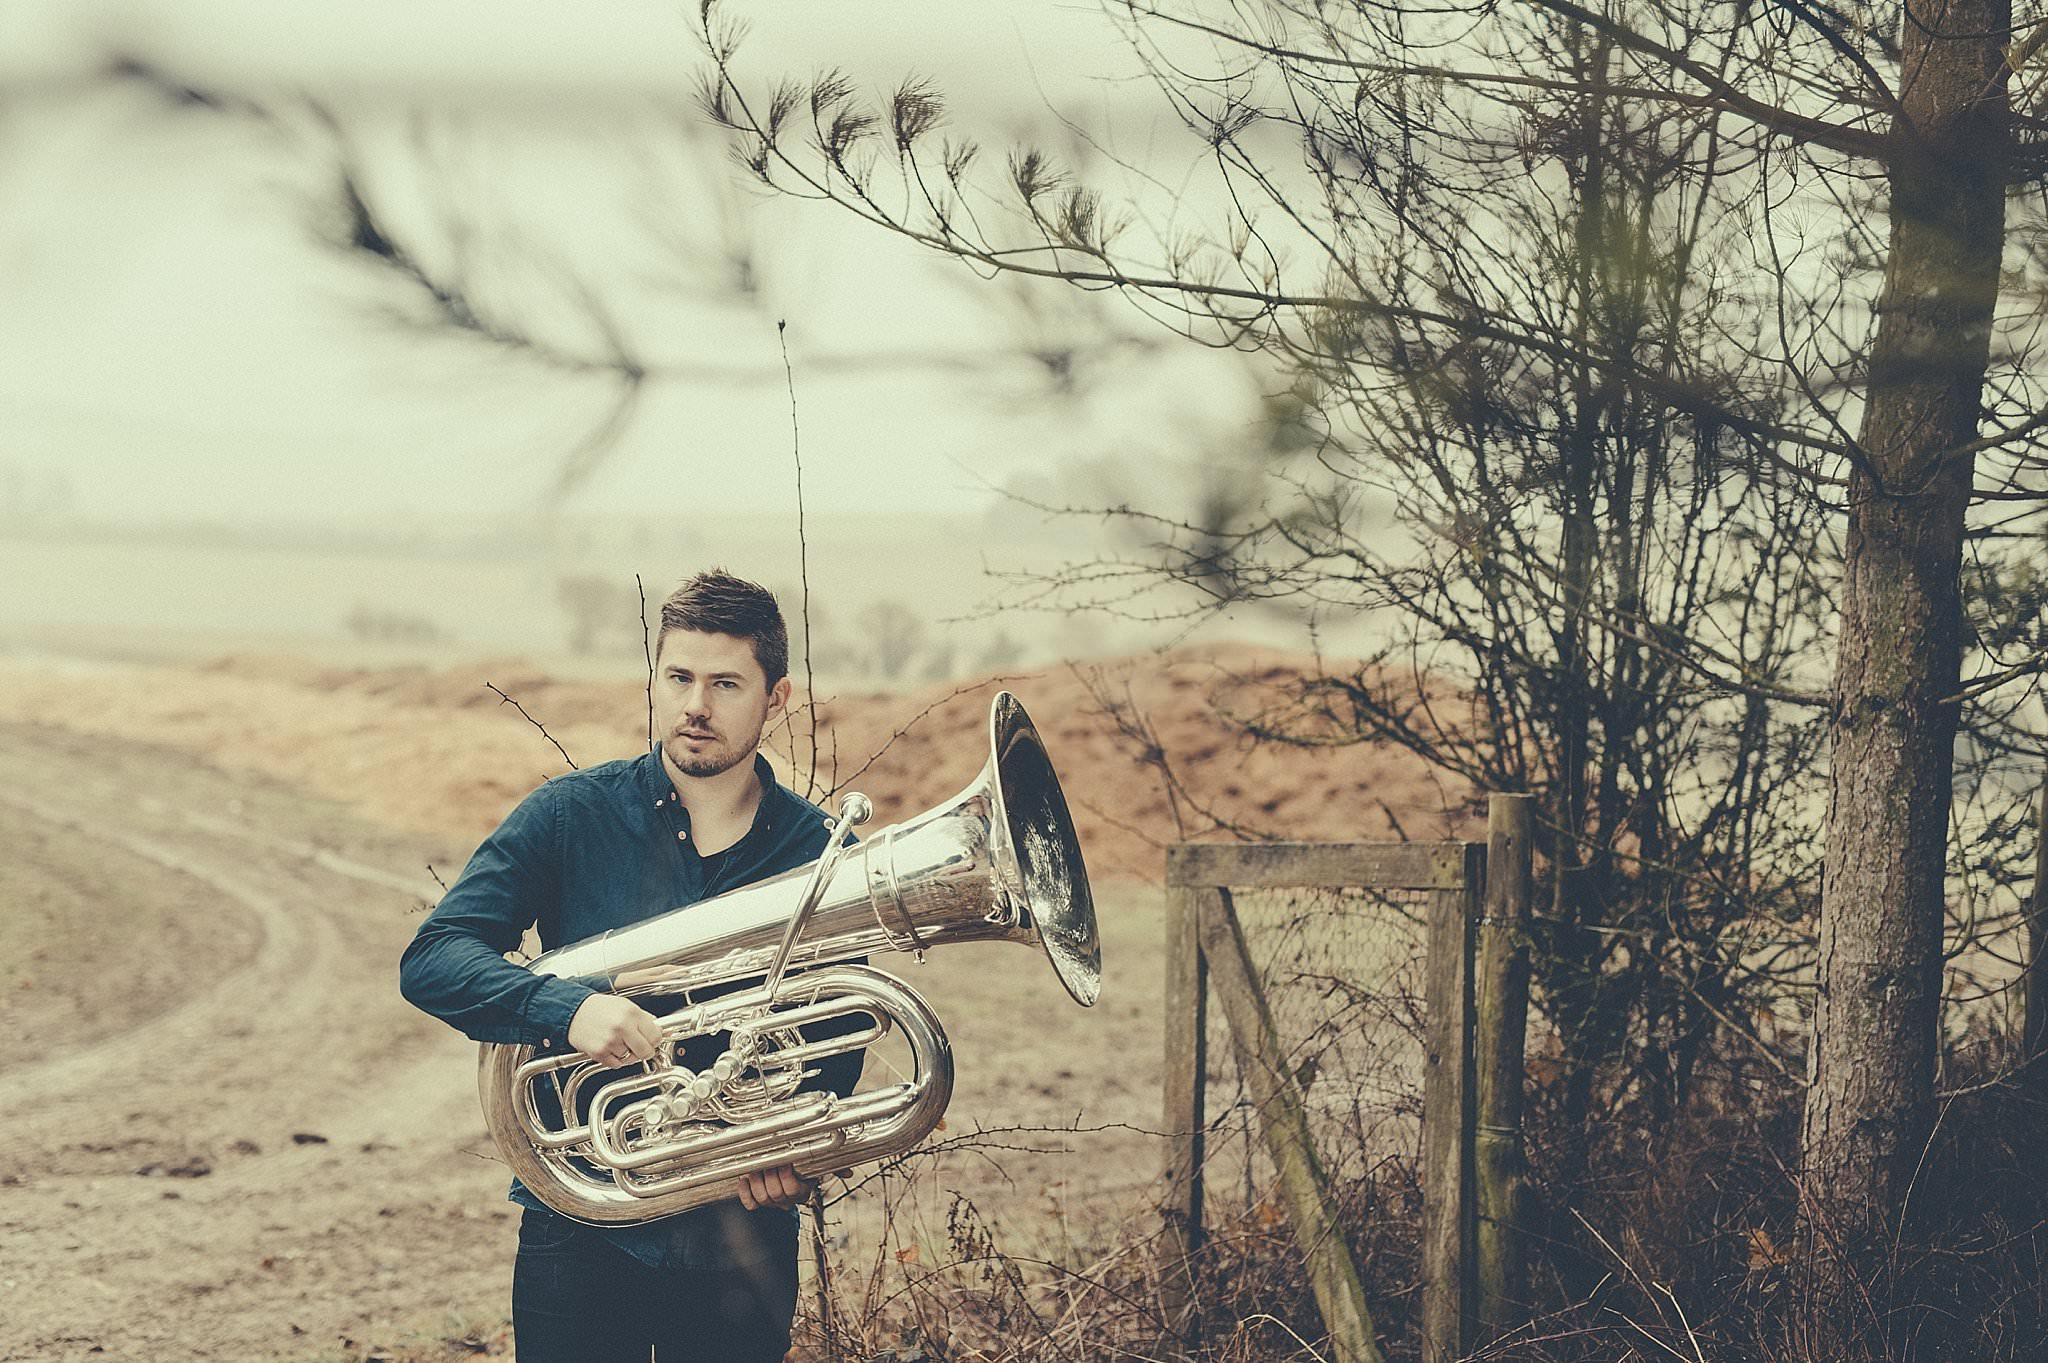 aga-tomaszek-music-photographer-cardiff_1308